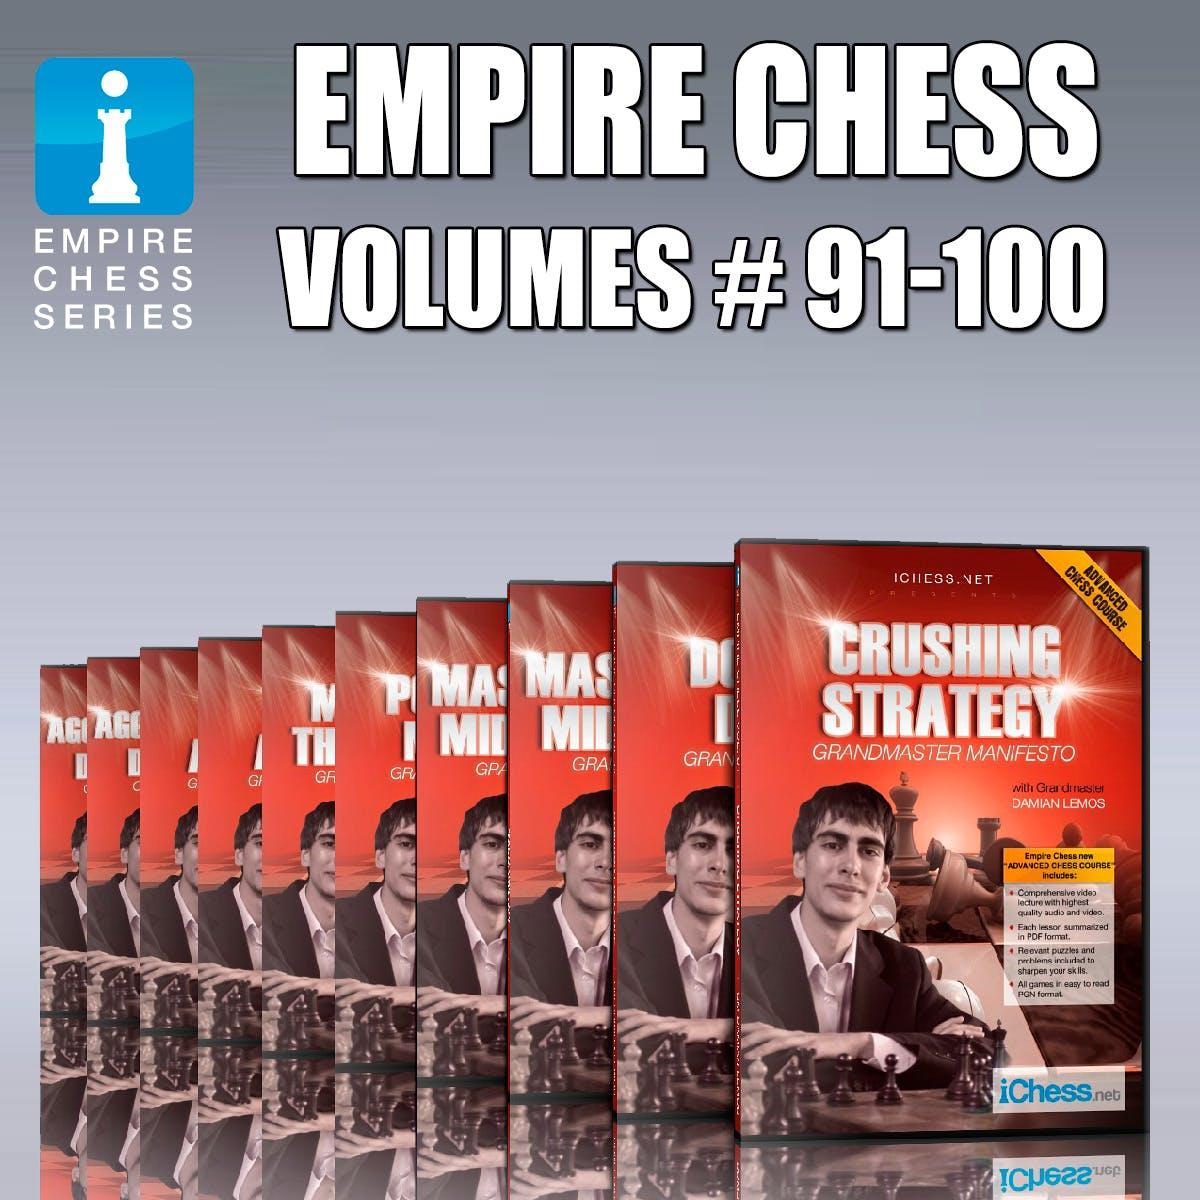 Empire Chess 91-100 - The Grandmaster Manifesto